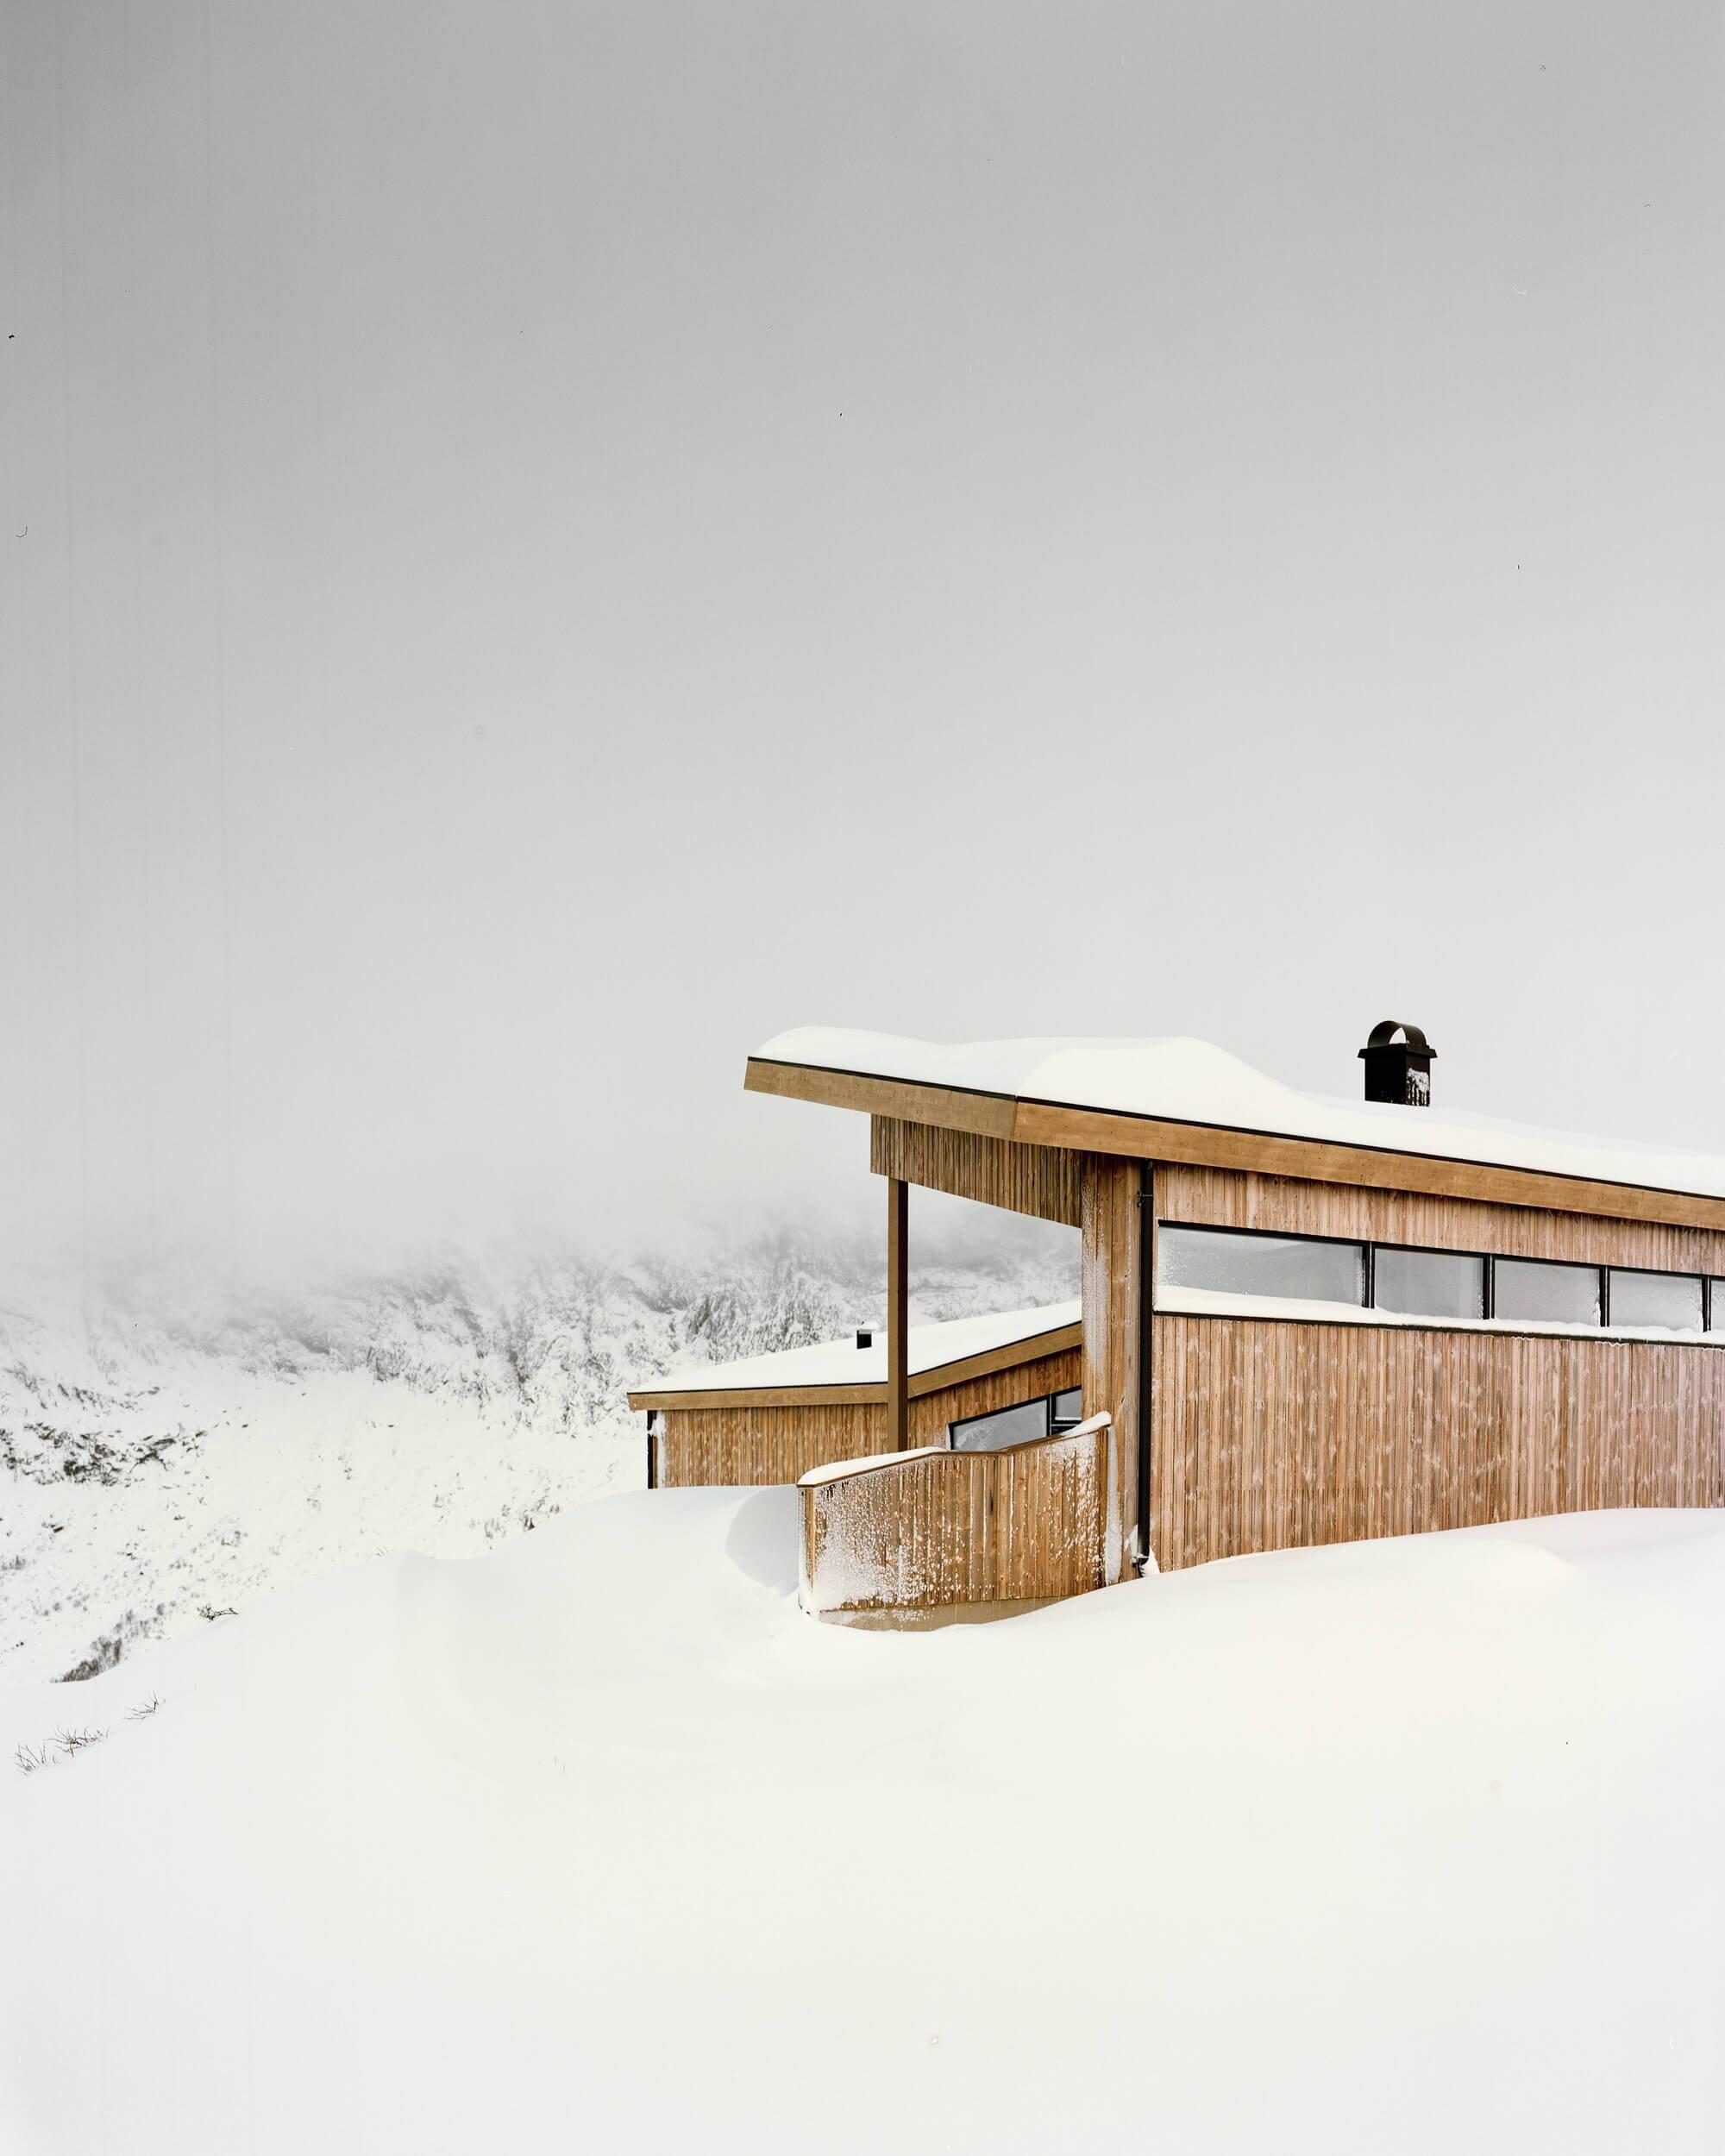 Gubrandslie-Cabin-Helen-&-Hard-architects-Norway-7